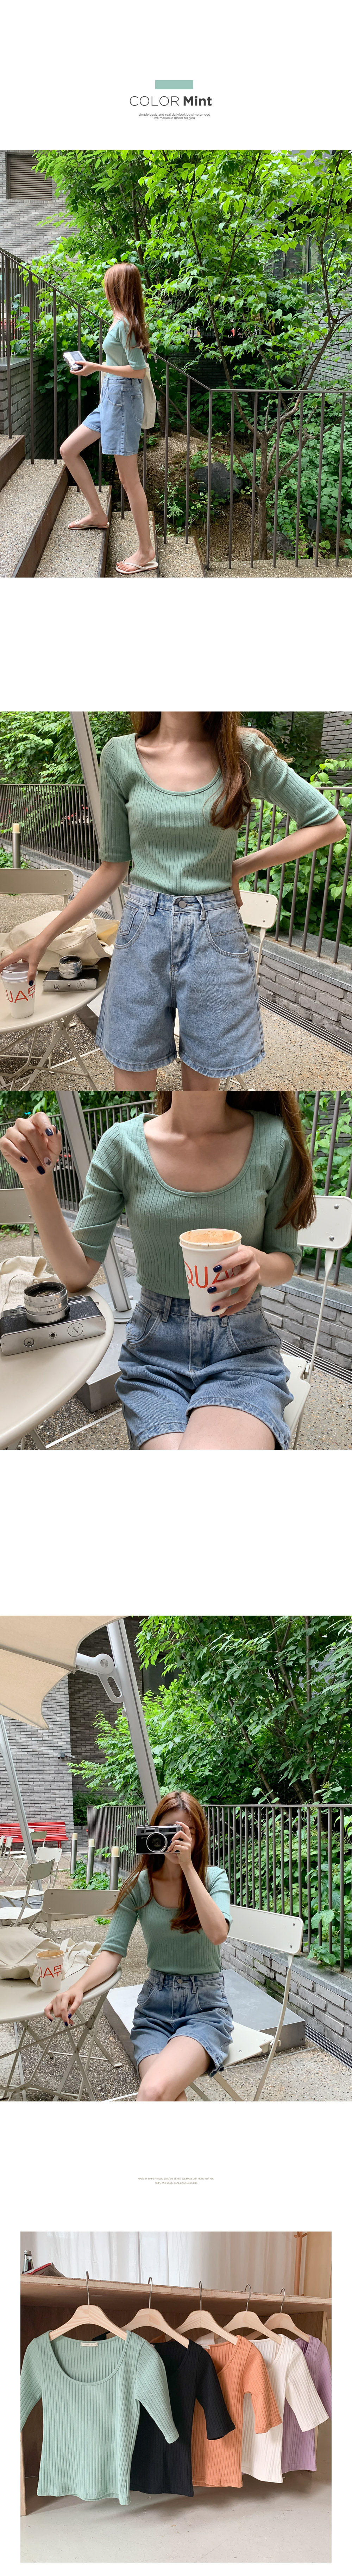 Lufen Ribbed Round Neck Short Sleeve T-Shirt